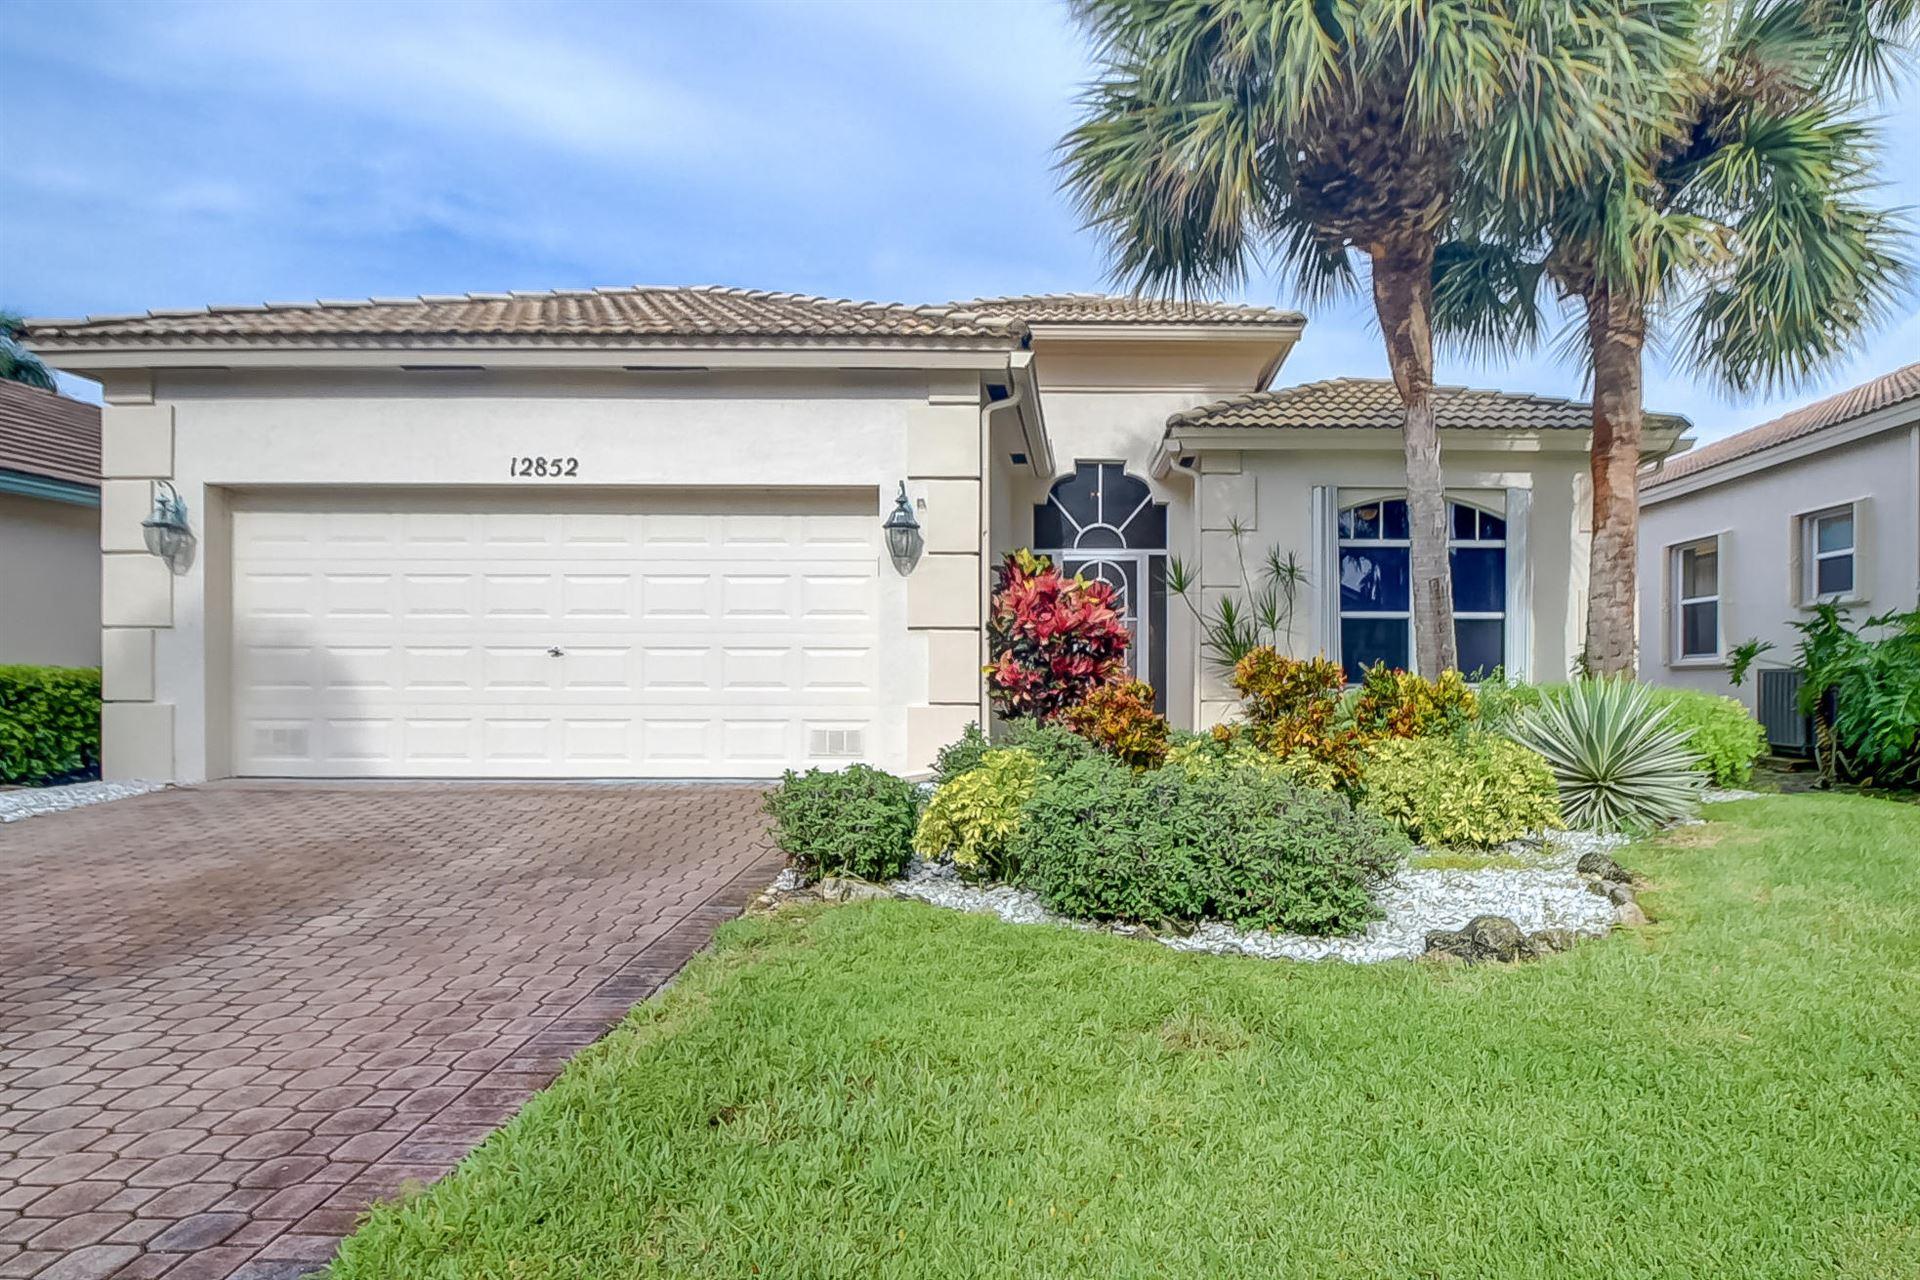 Photo of 12852 Coral Lakes Drive, Boynton Beach, FL 33437 (MLS # RX-10658126)